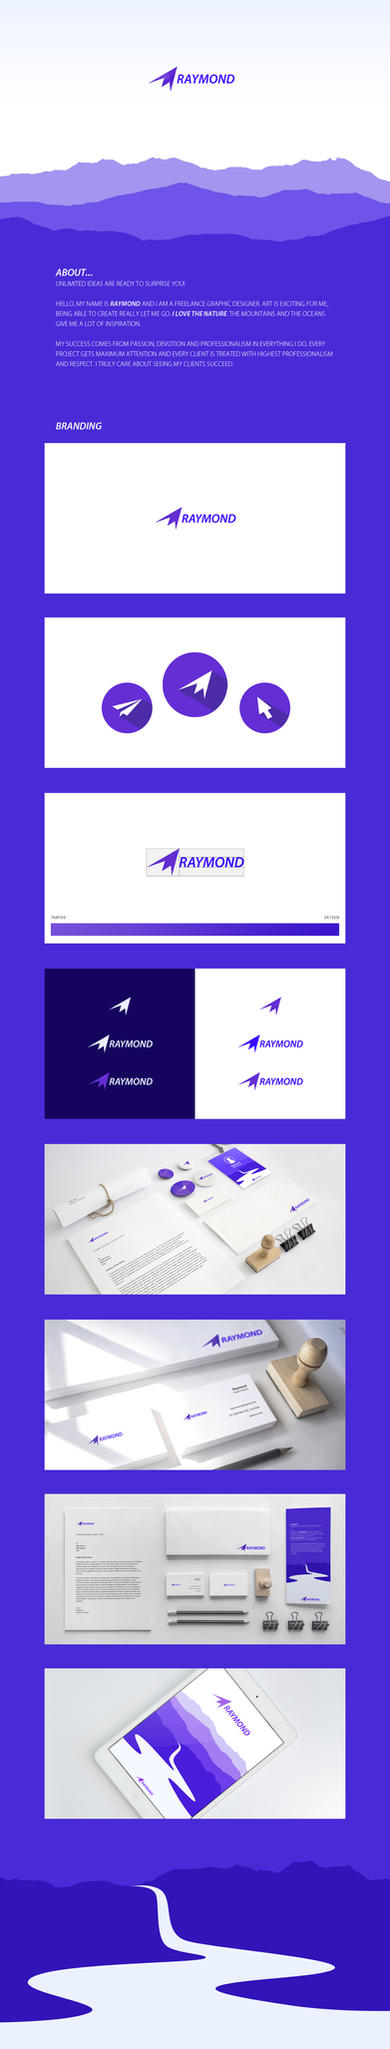 Raymond Branding by RaymondGD